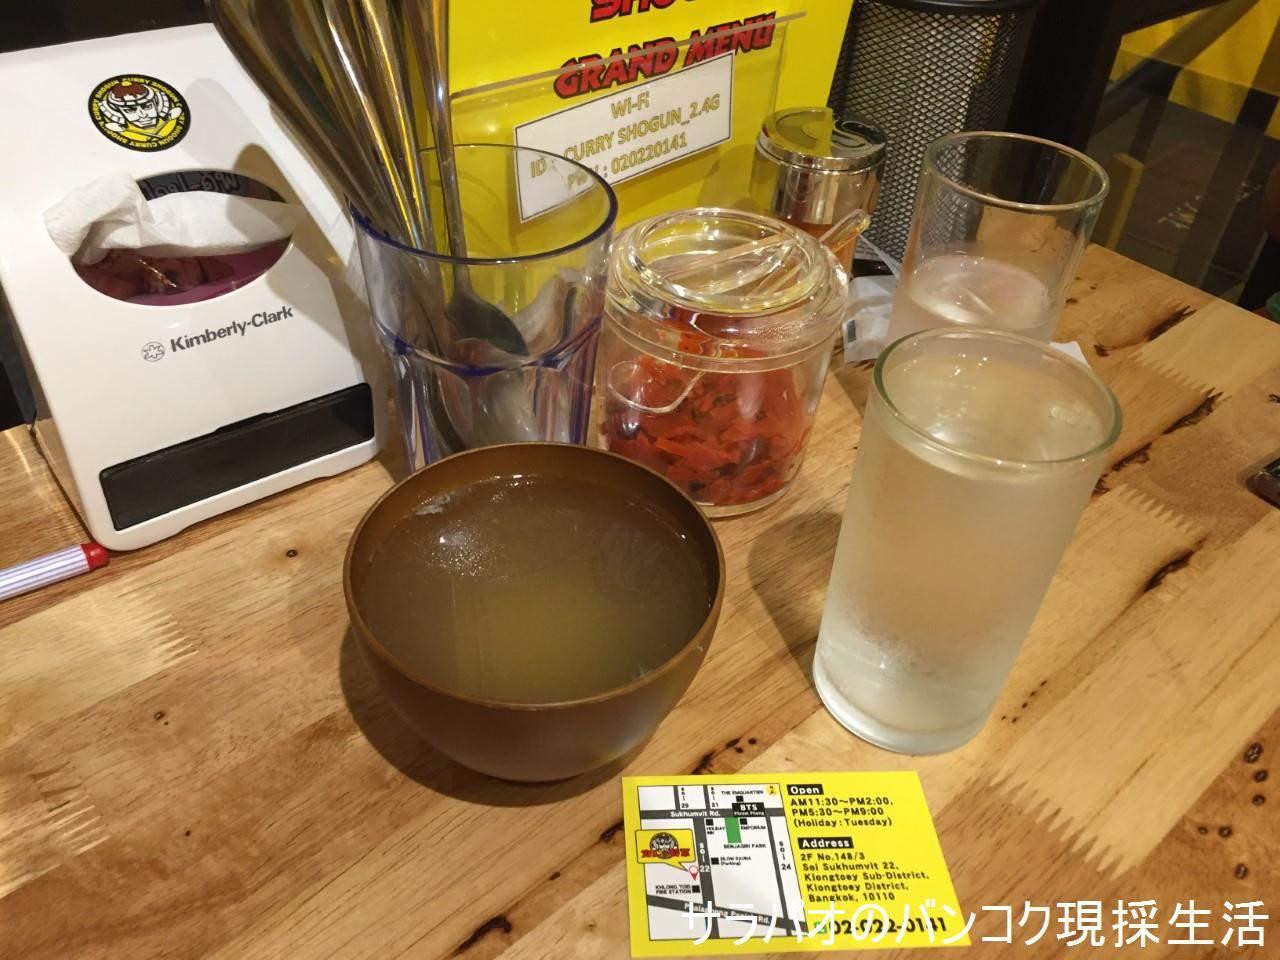 CurryShogun_12.jpg